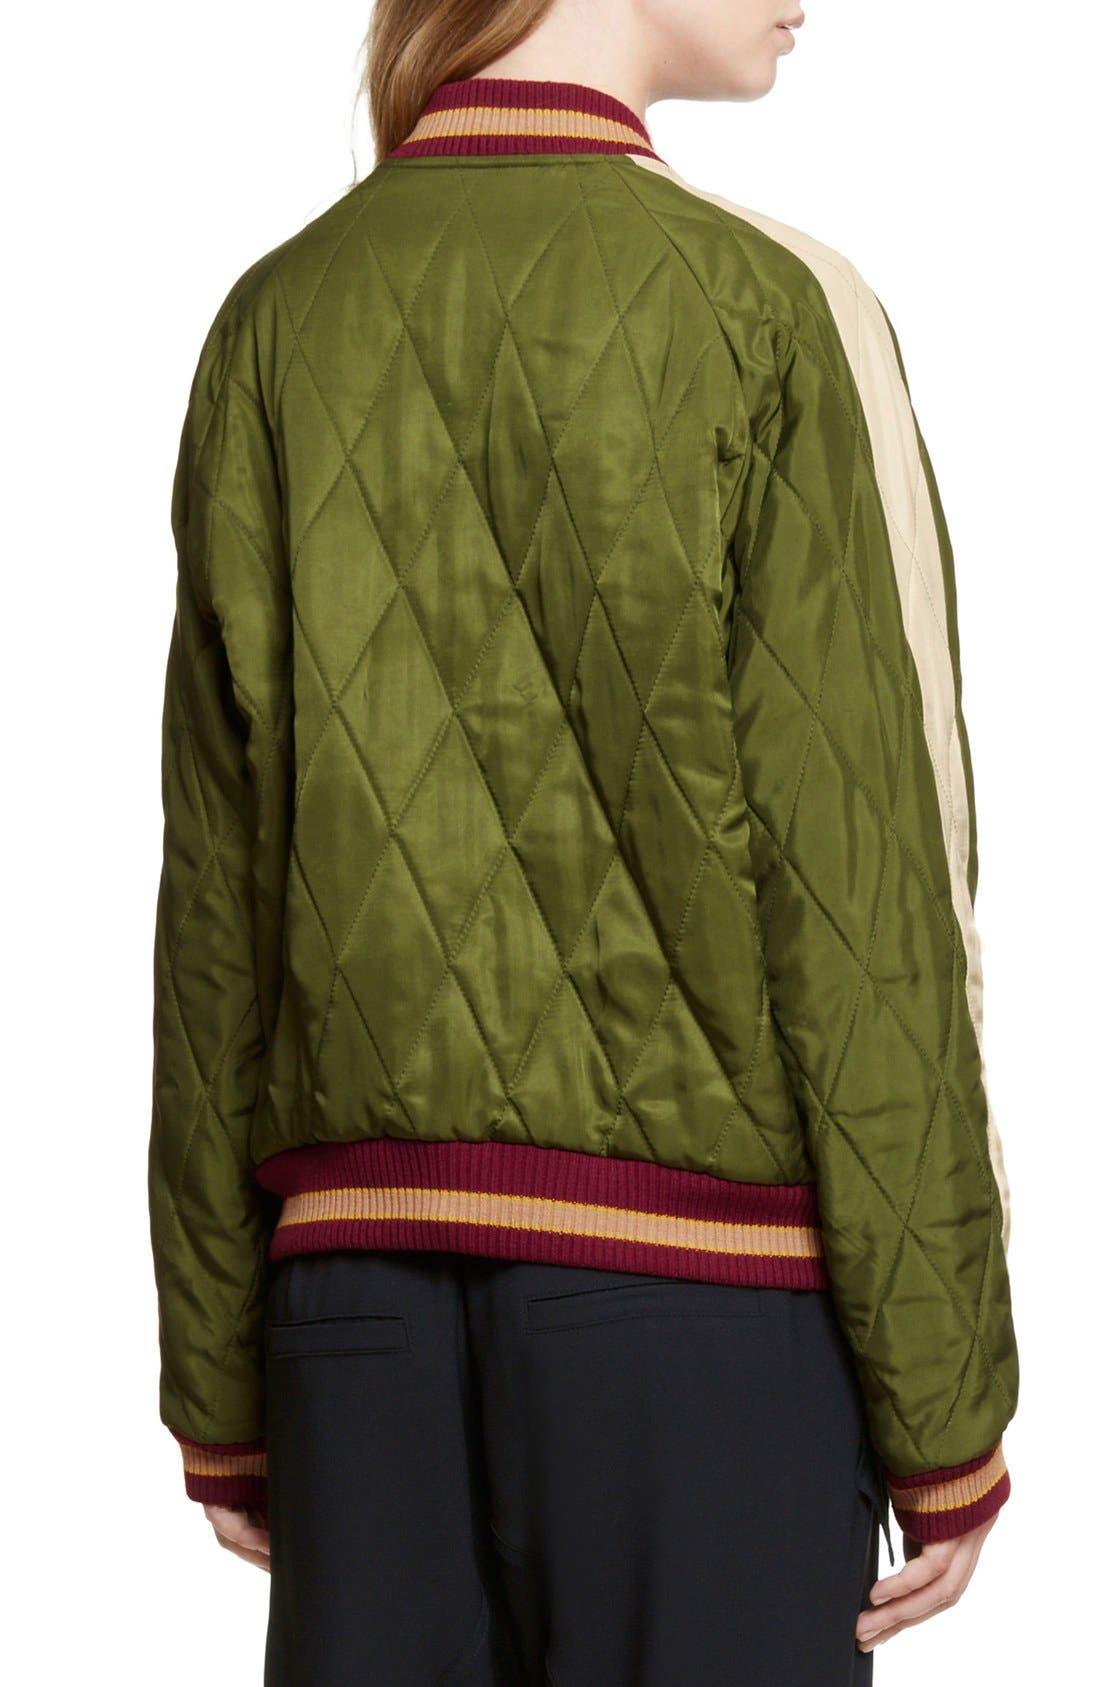 CHLOÉ, Reversible Embroidered Tech Satin Bomber Jacket, Alternate thumbnail 6, color, 301